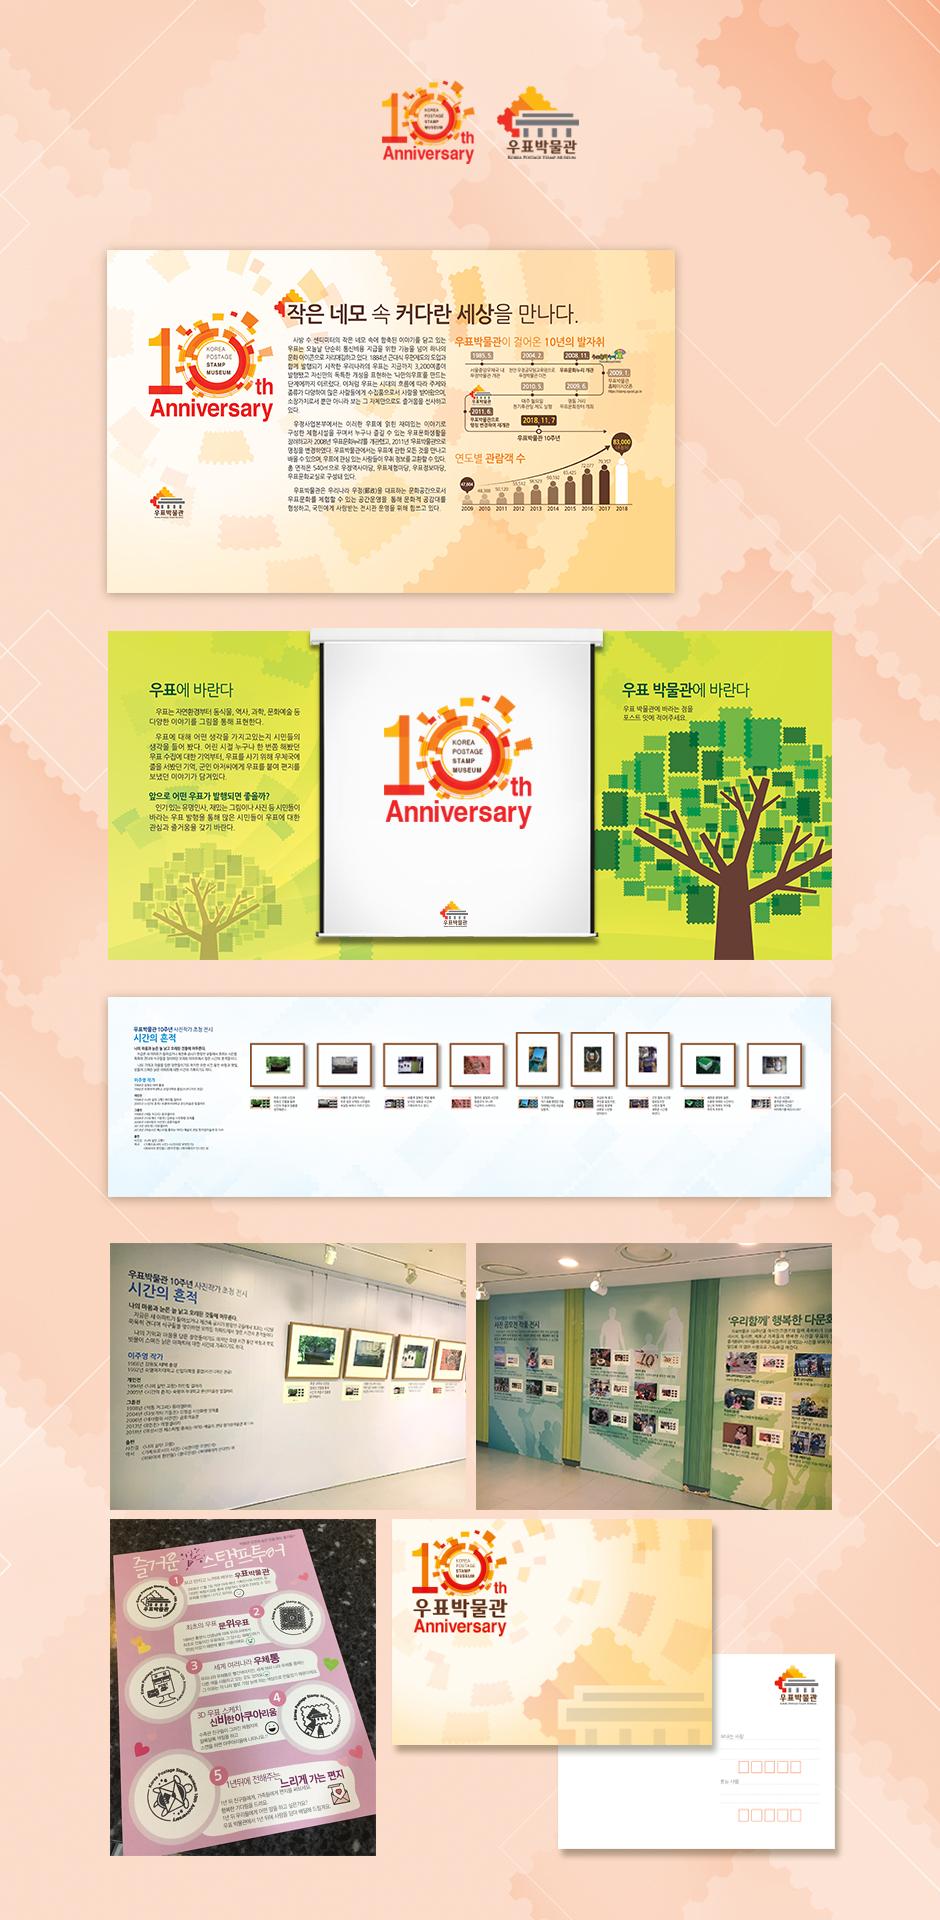 2018_posa_postmuseum10anniversary_exhibition_contents_